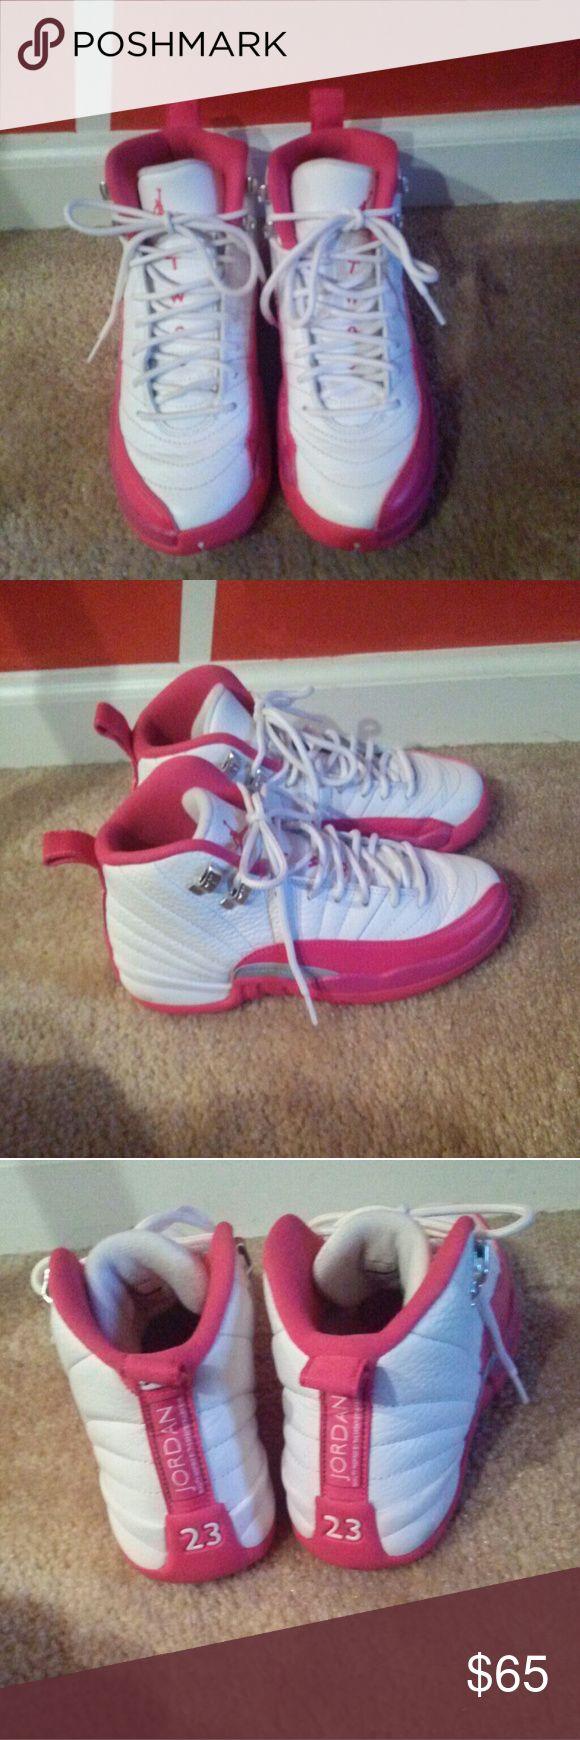 Jordan retro 12 Pink/white Jordan retro 12 gently used in excellent condition, no scuffs or scrapes. 4y in boys = 6 in women Jordan Shoes Sneakers